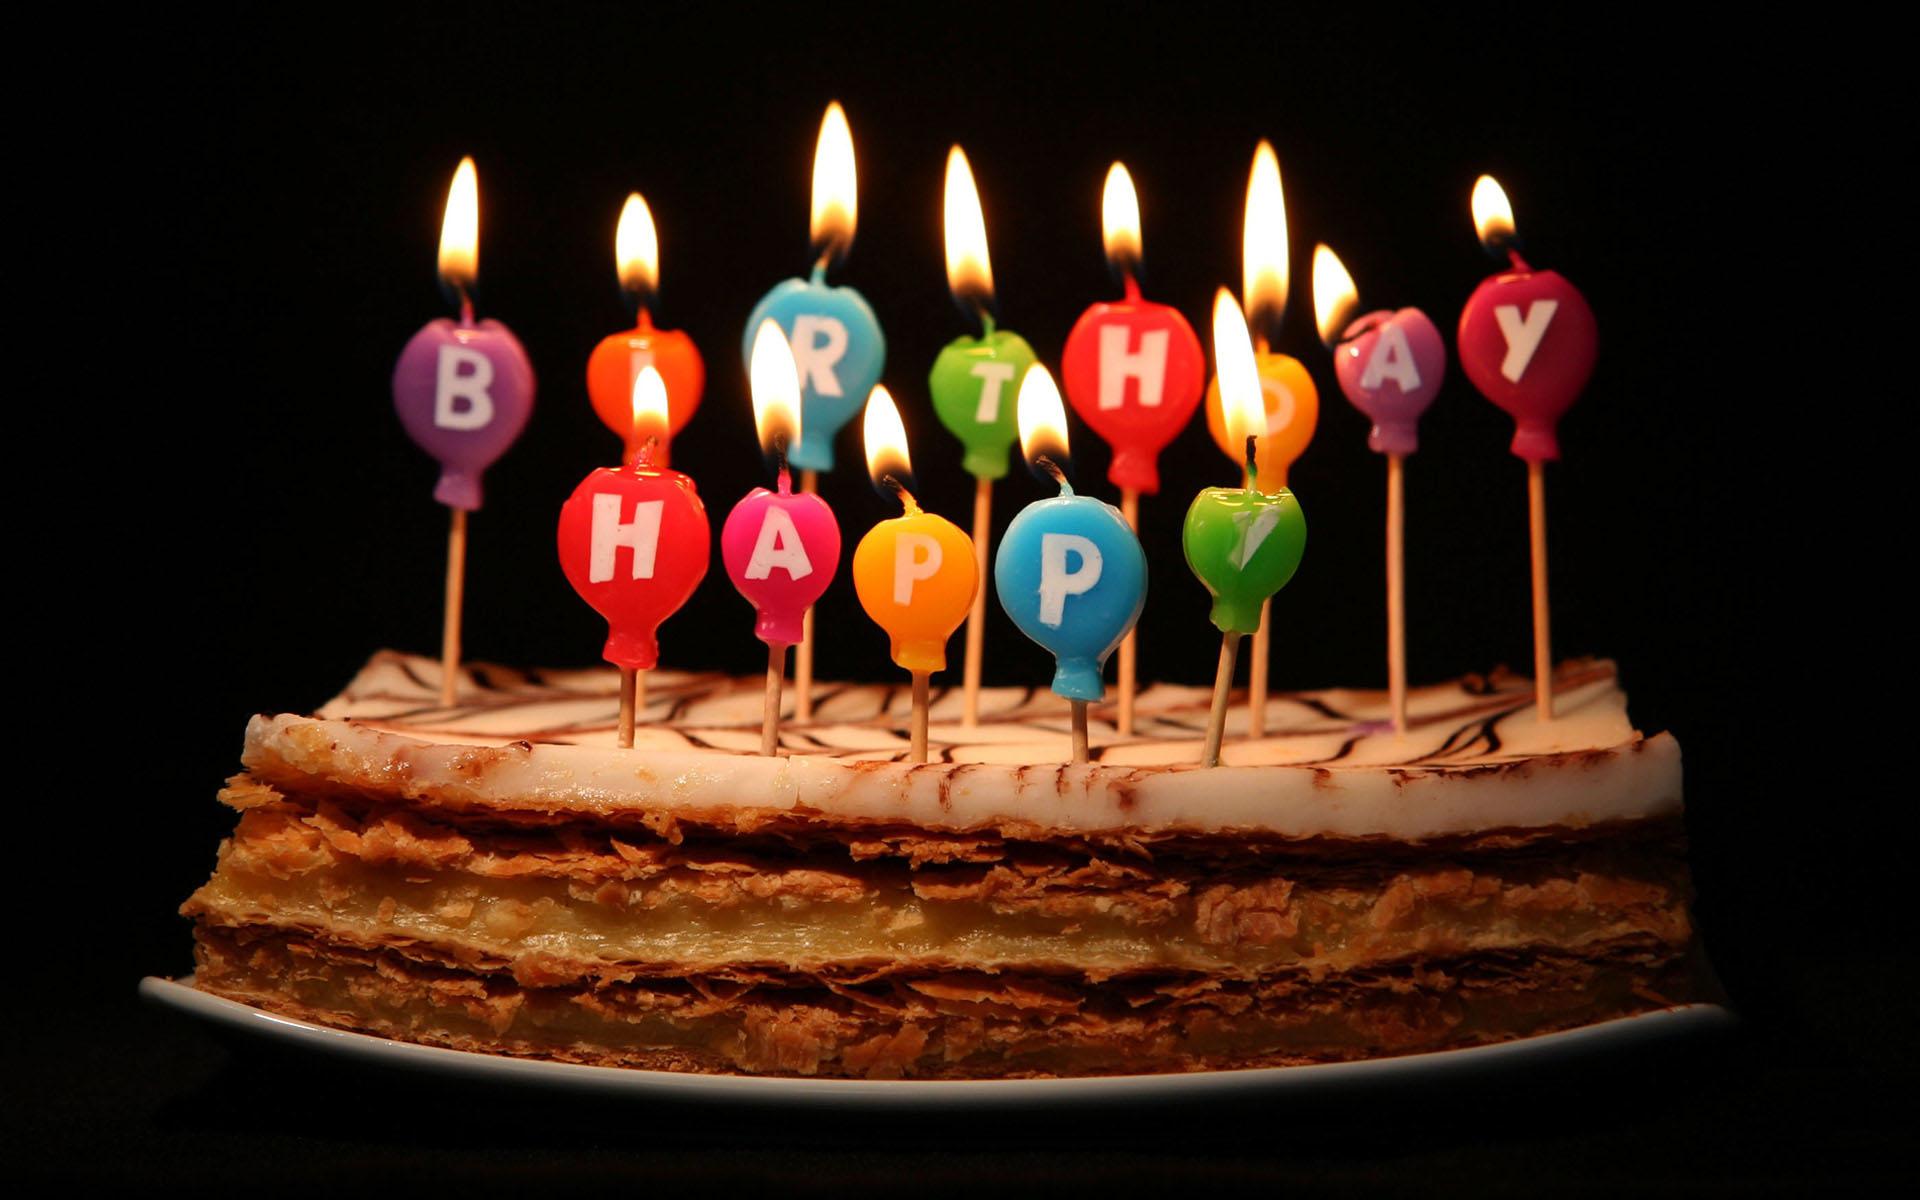 Download Free Happy Birthday Wishes Hd Pictures Happy Birthday Cakes With Candles 1920x1200 Download Hd Wallpaper Wallpapertip